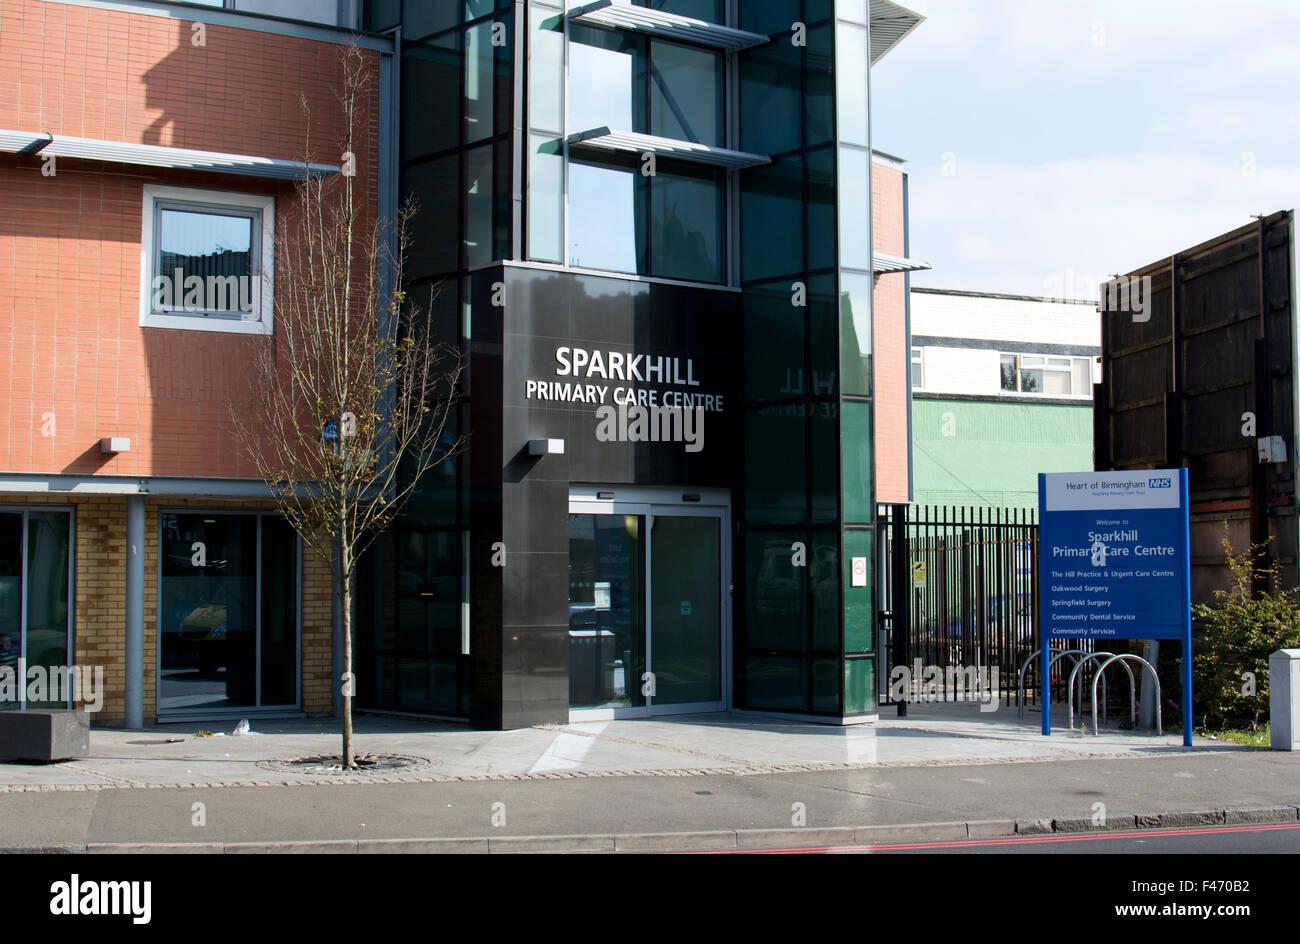 Sparkhill Primary Care Centre, Birmingham, West Midlands, UK - Stock Image